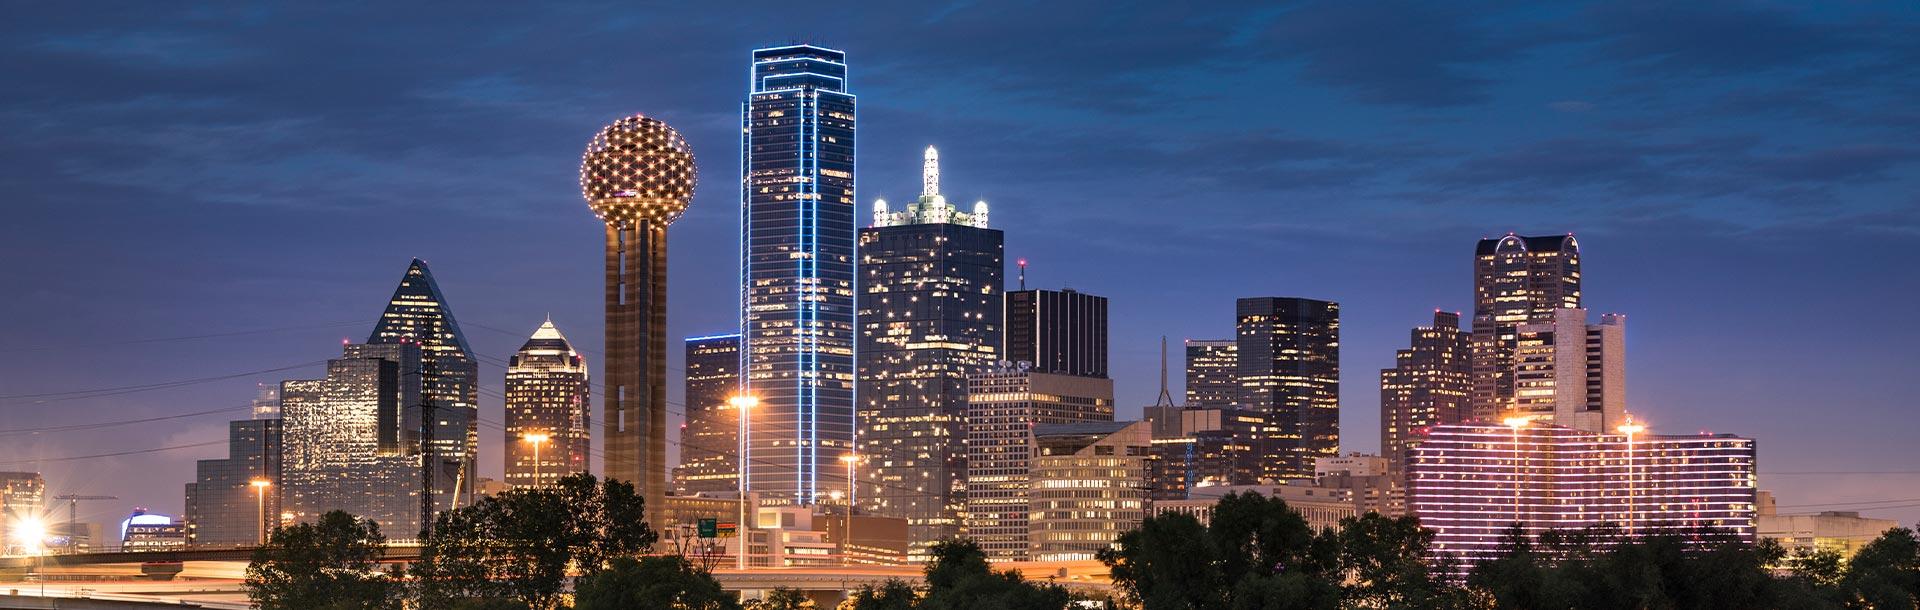 Kbp Brands Dallas